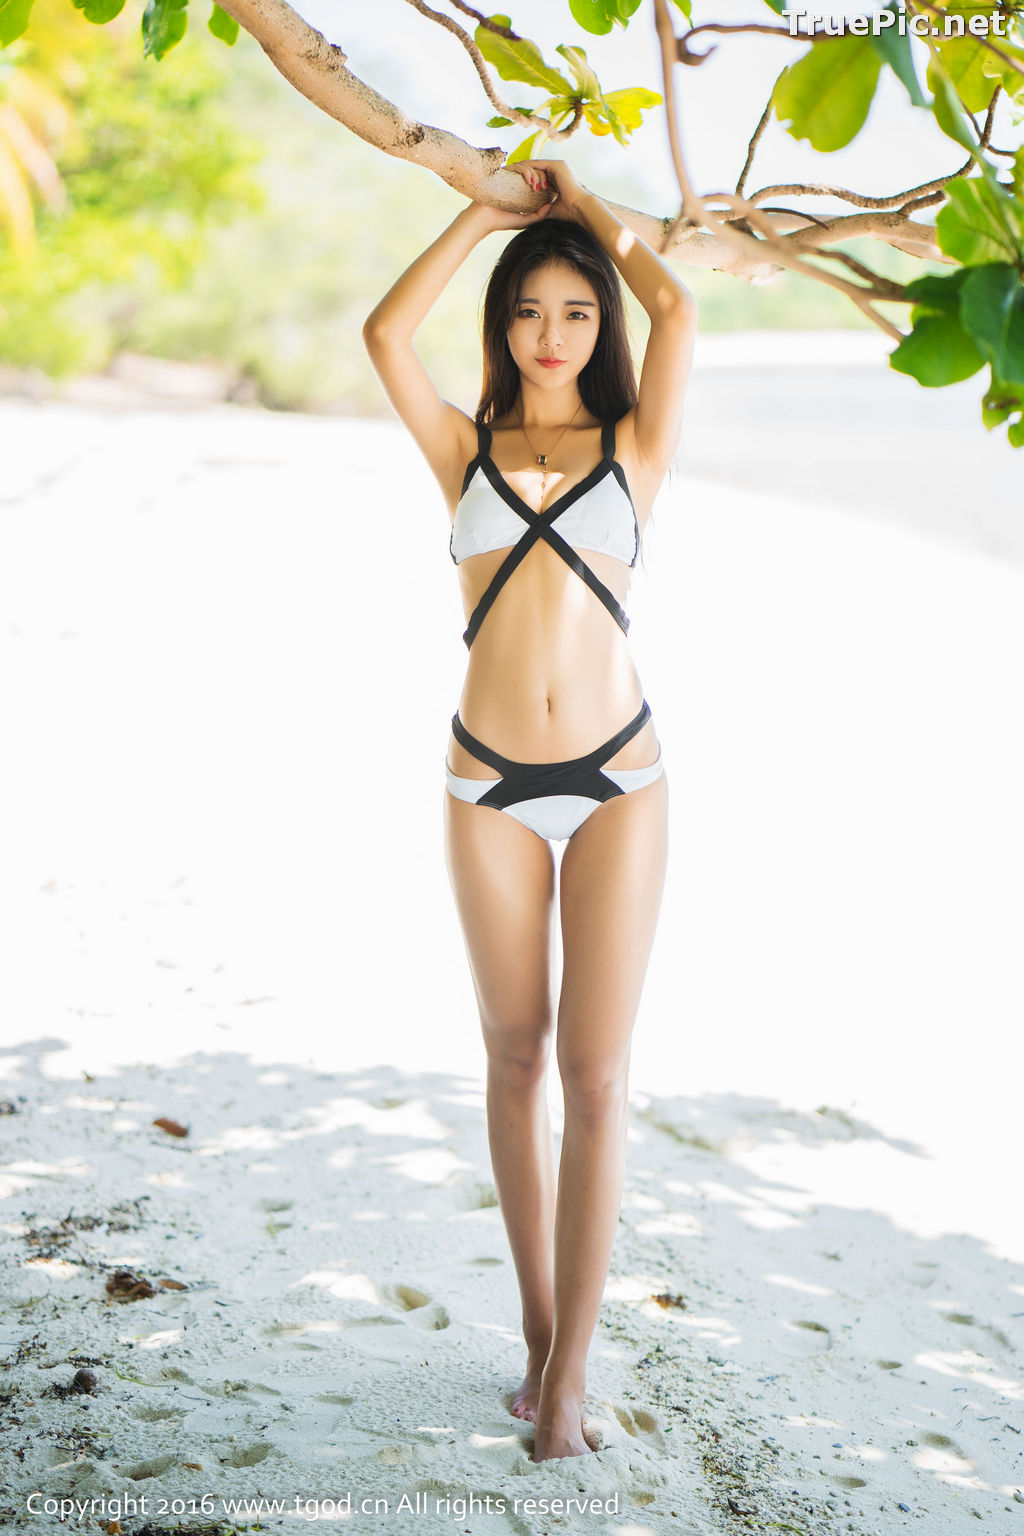 Image TGOD Photo Album – Ke Le Vicky (可乐Vicky) - From Student Uniform to Bikini - TruePic.net - Picture-2